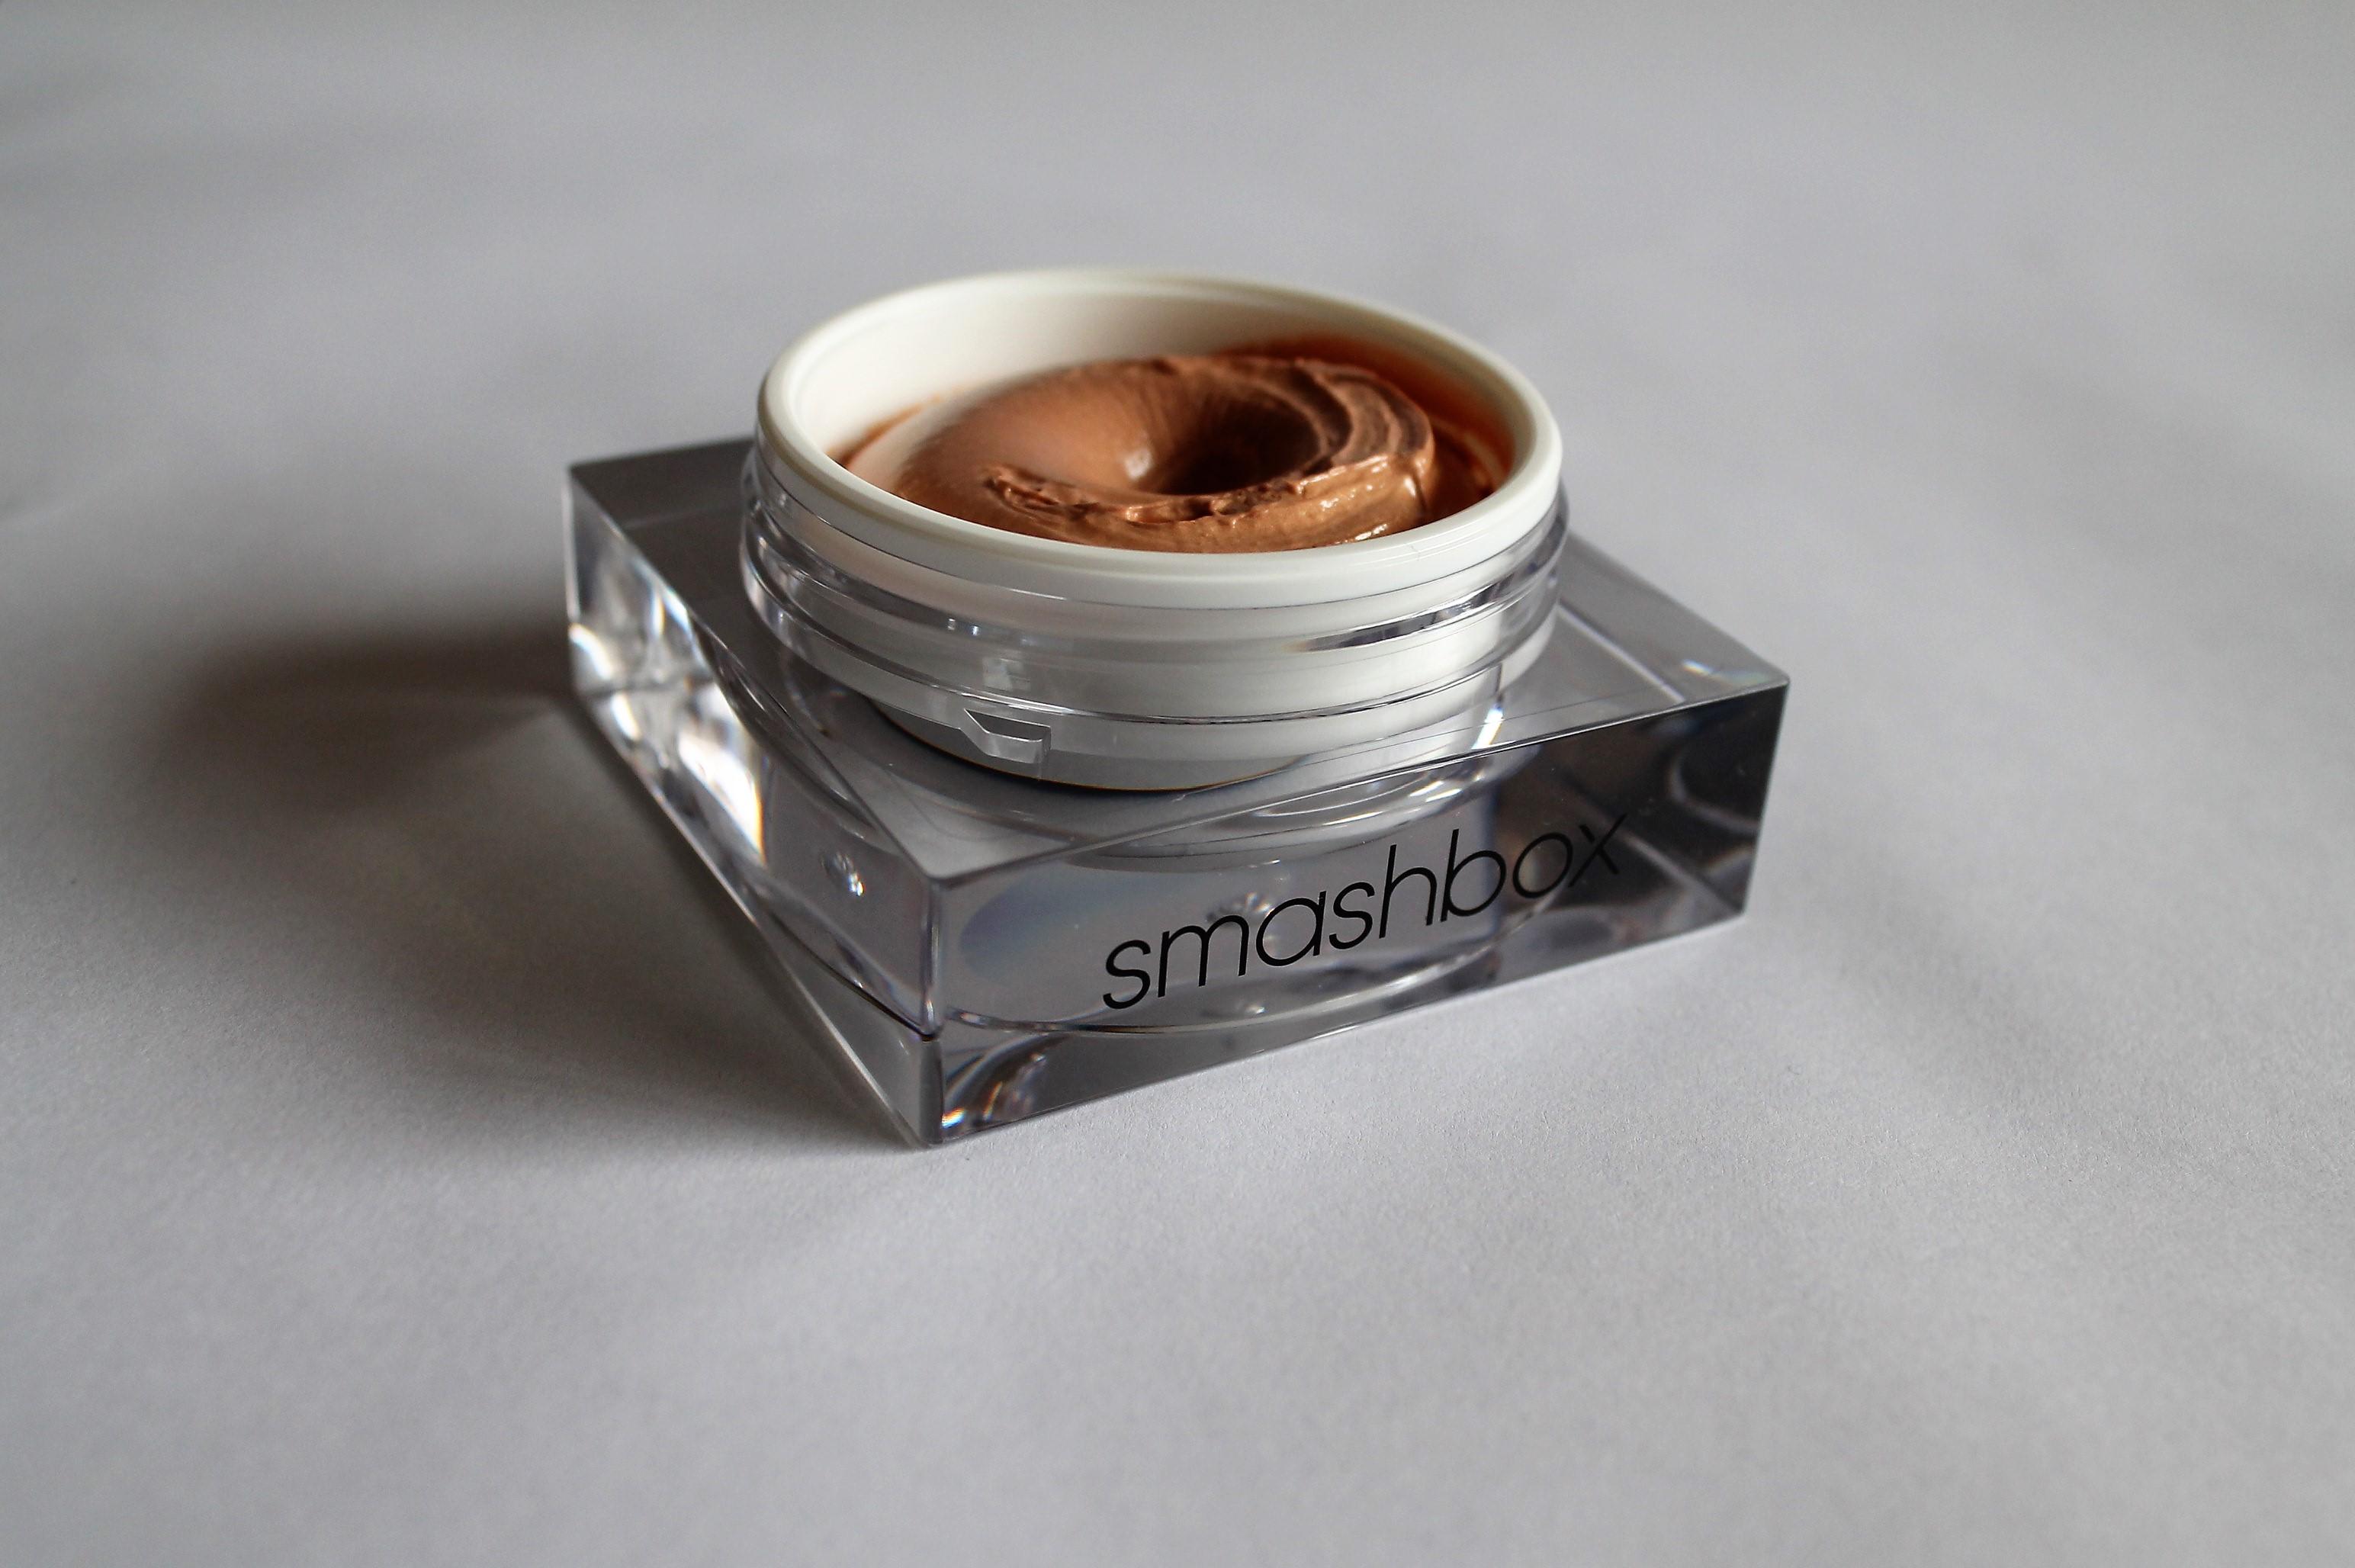 Smashbox Radiance Primer